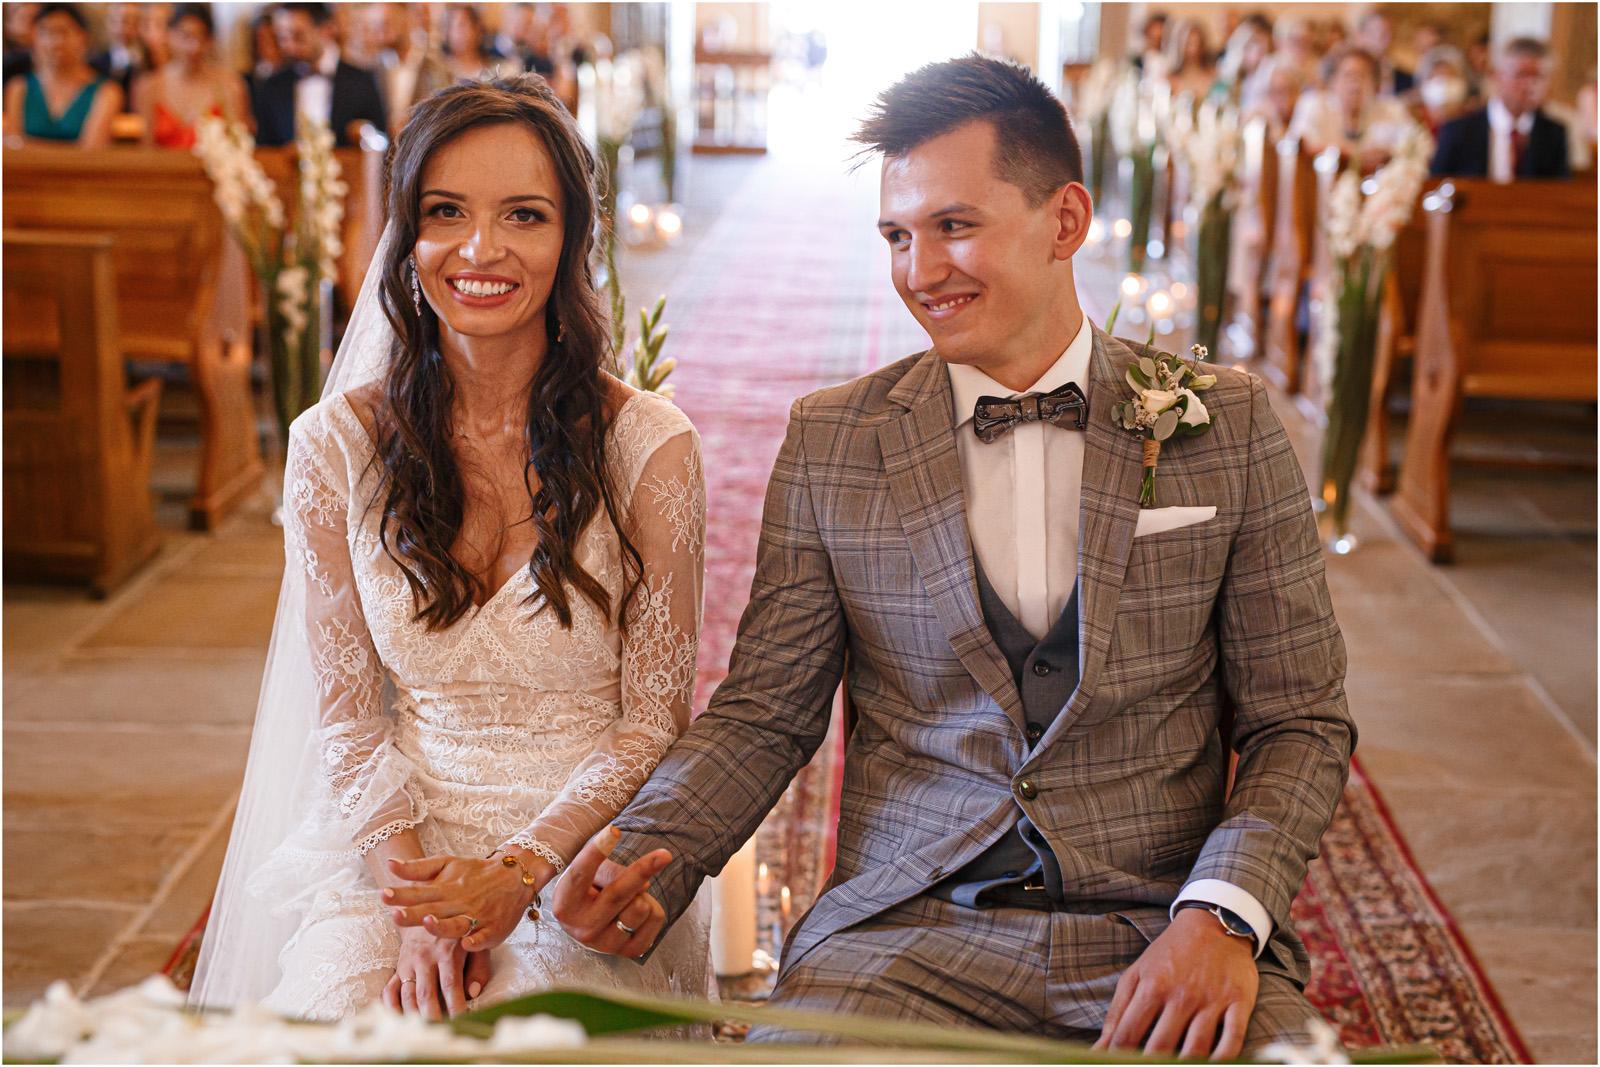 Ania & Mateusz | boho wesele w Stodole pod Kasztanami 47